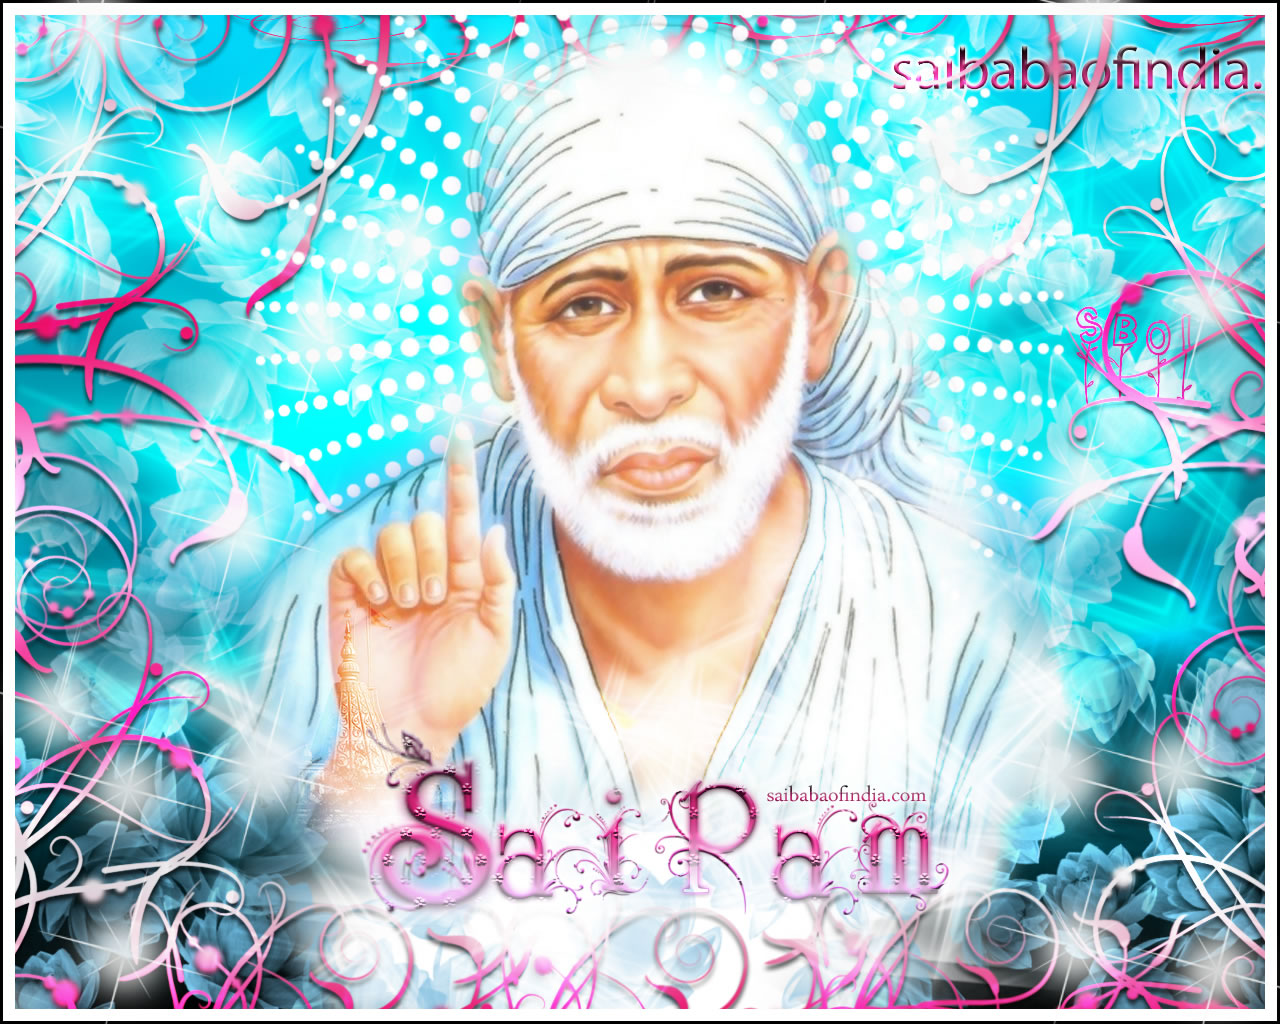 http://1.bp.blogspot.com/-1GPaOVCgdVM/T7jweHHjzpI/AAAAAAAACO0/-teiqy6LkGI/s1600/Sai-Baba-Wallpapers-2011-4.jpg